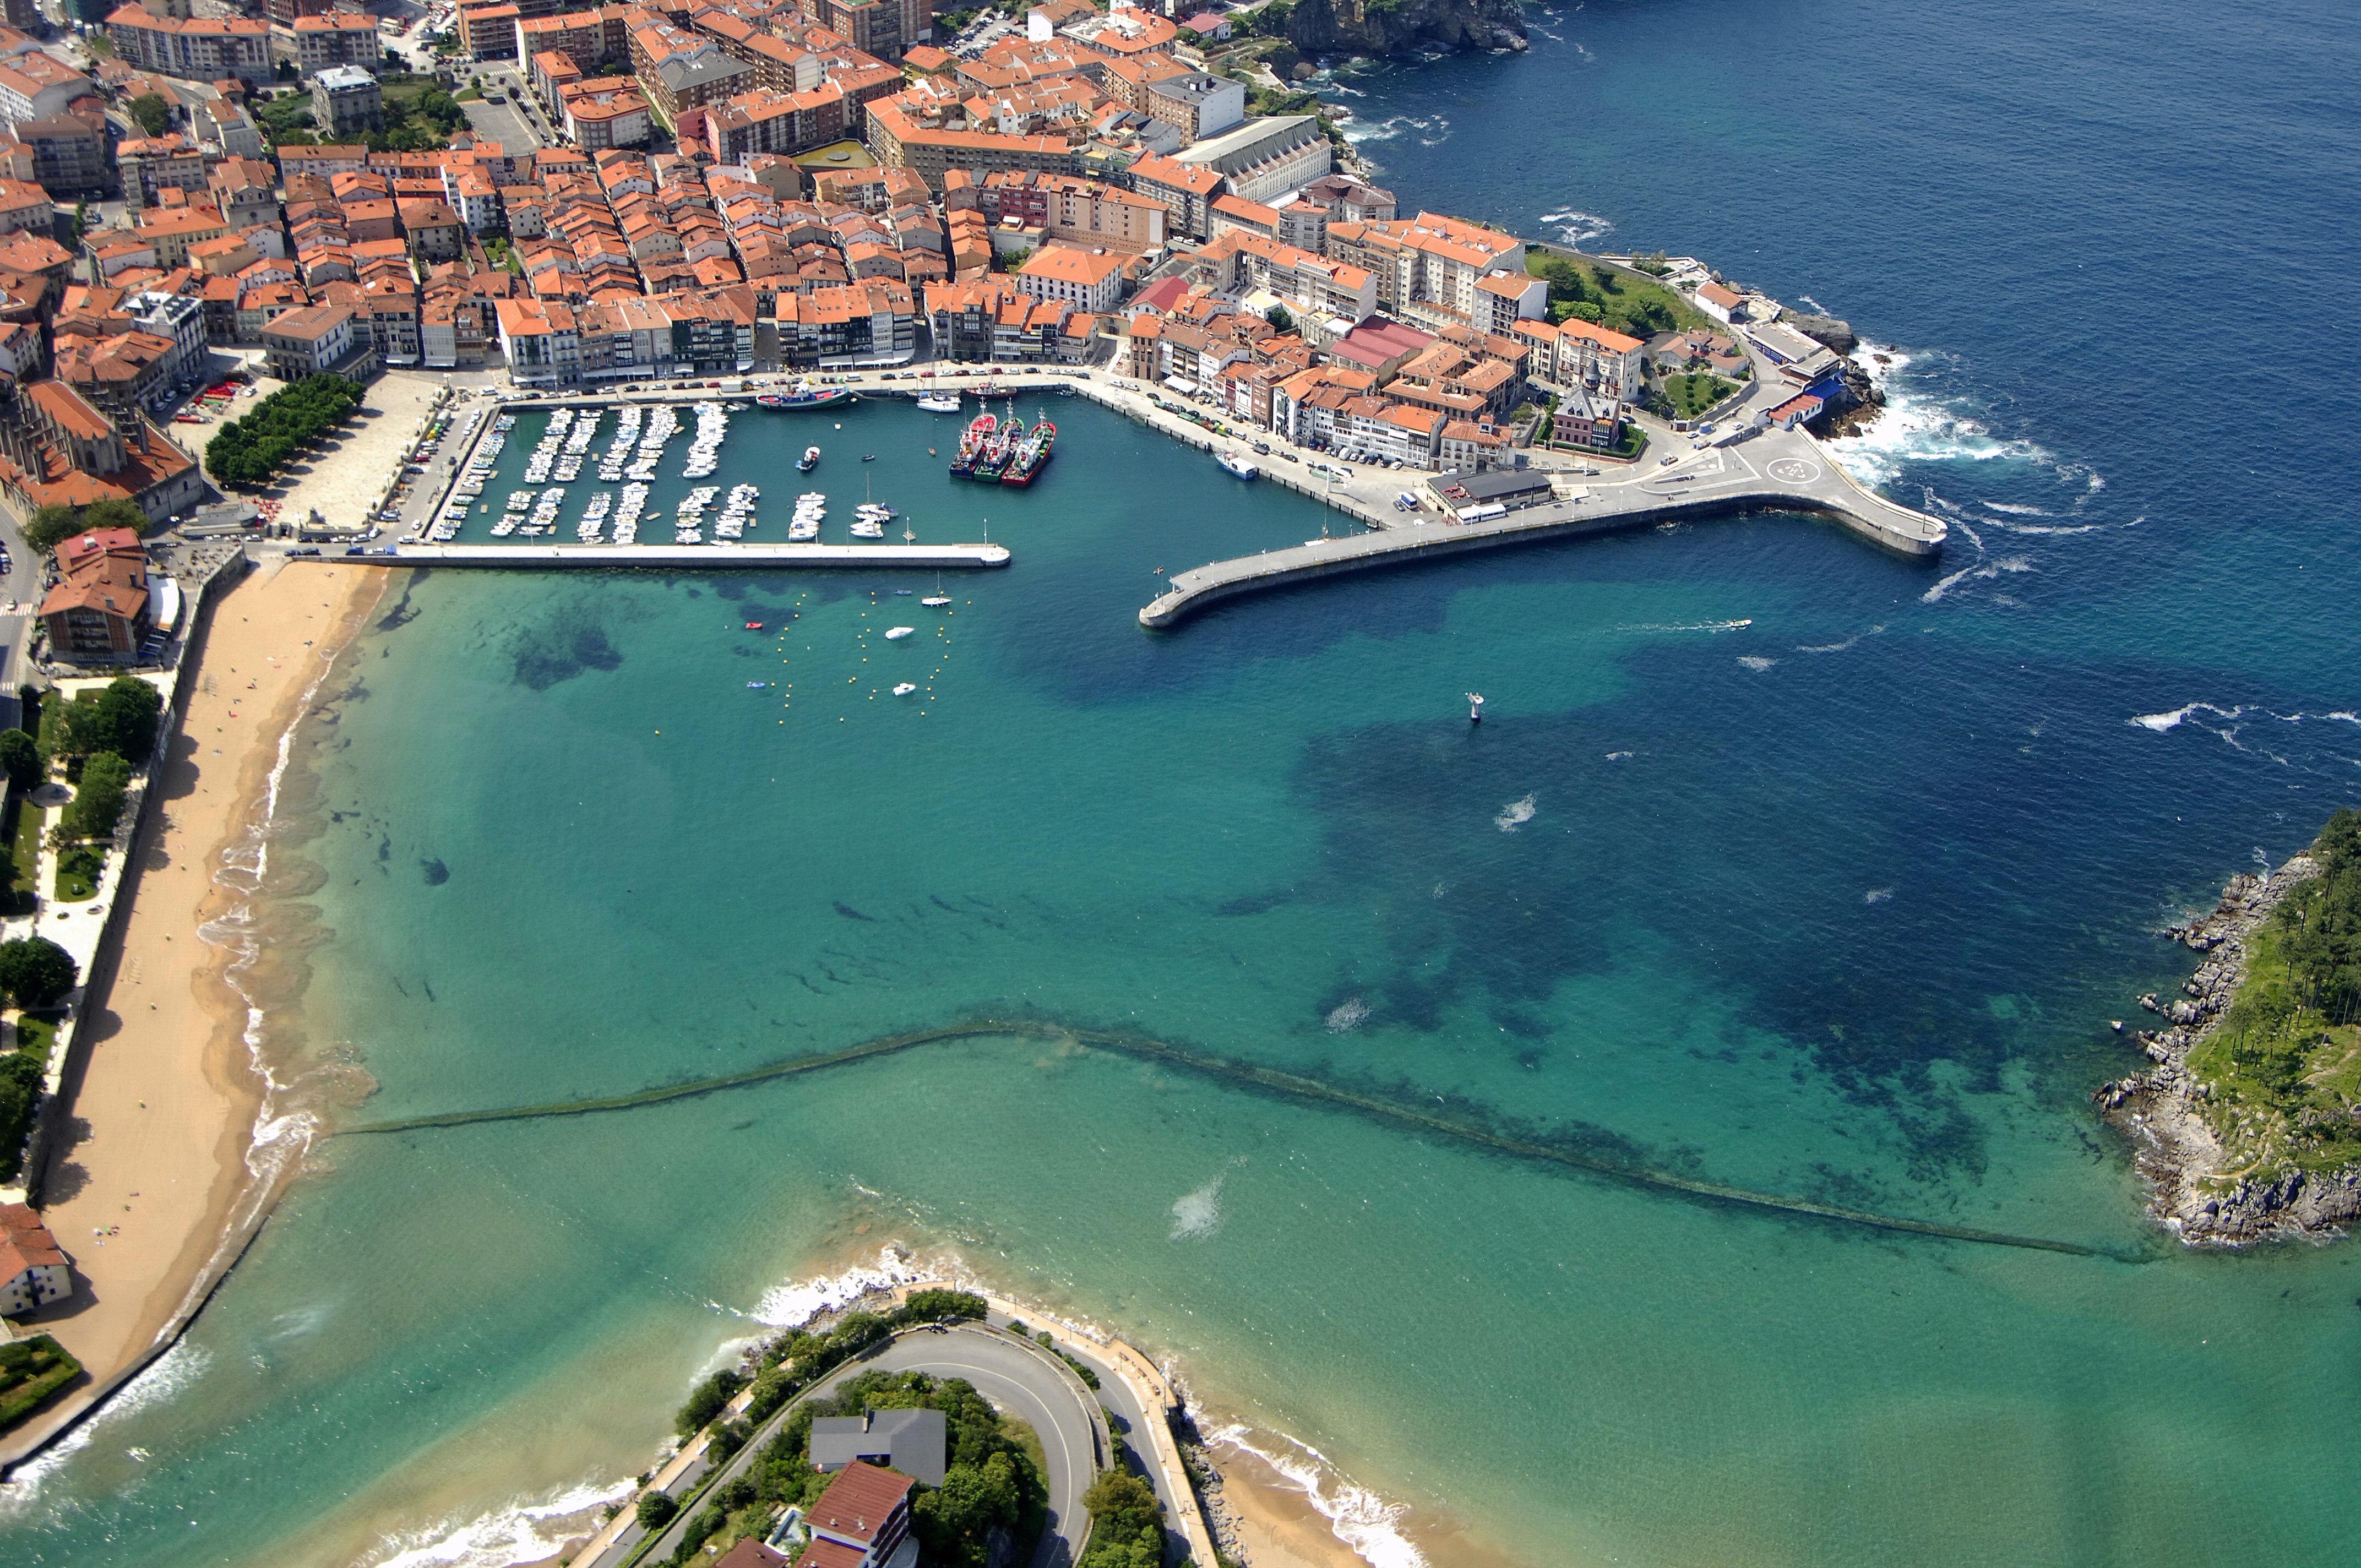 Puerto de lekeitio marina in lekeitio basque county spain marina reviews phone number - Puerto rico spain weather ...